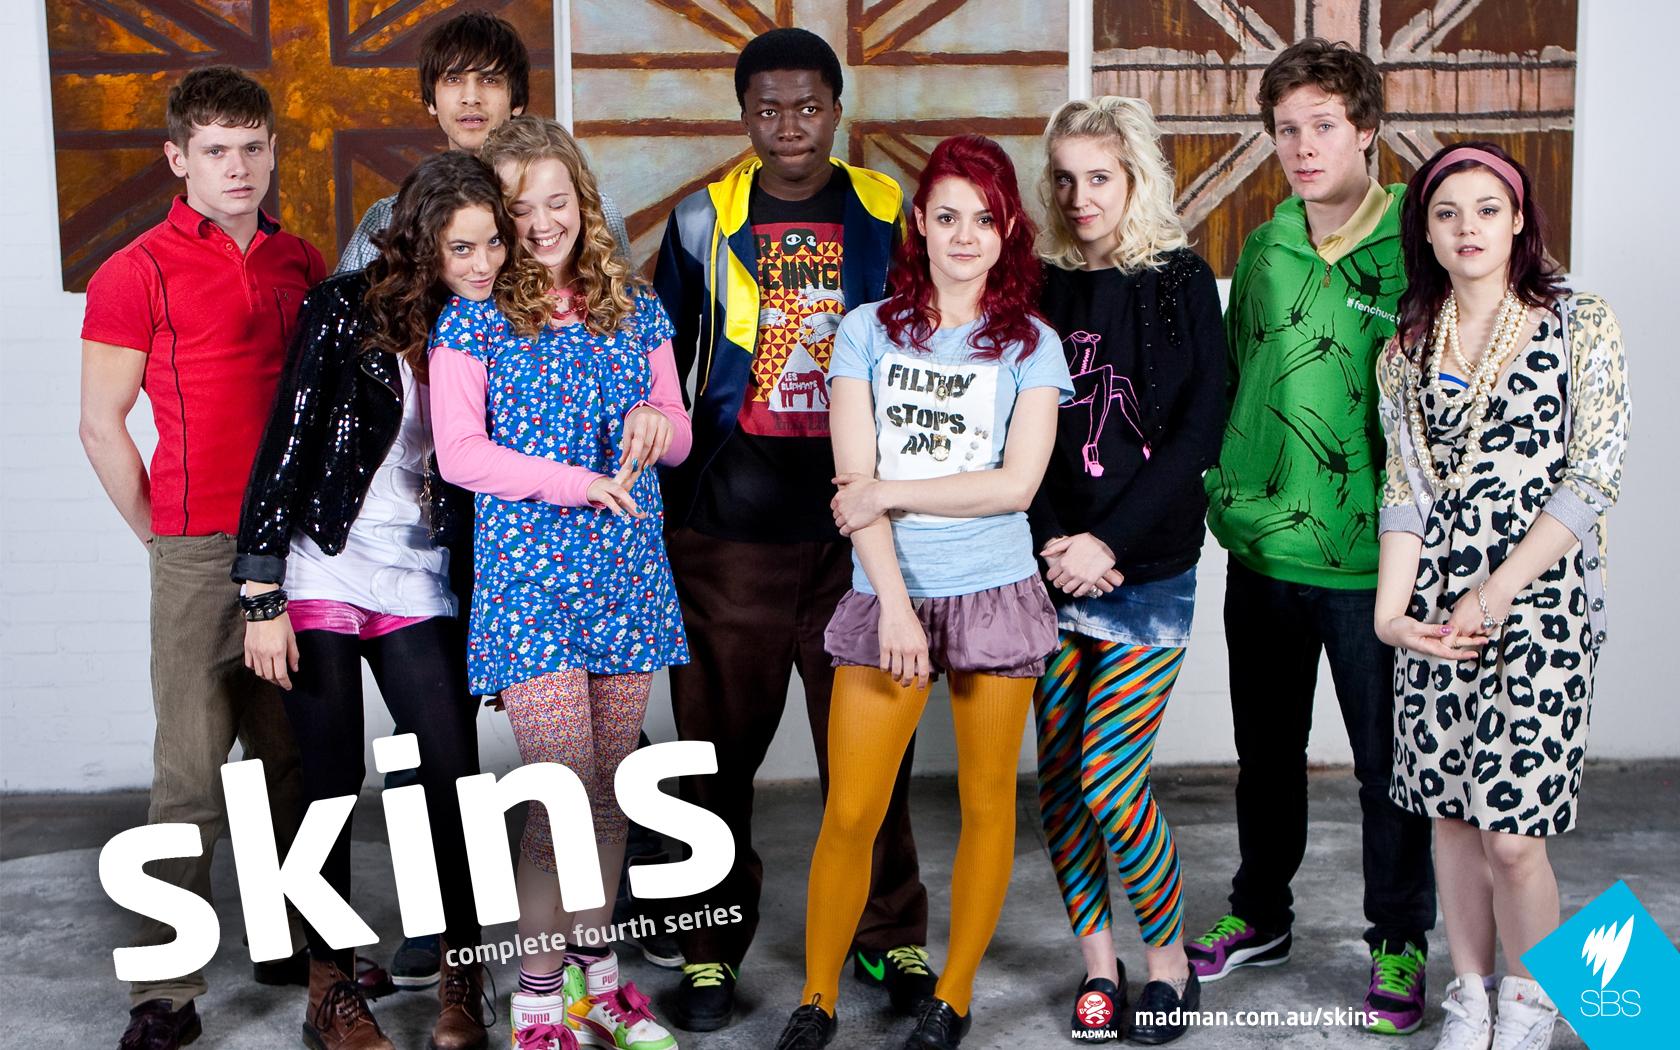 skins - photo #8